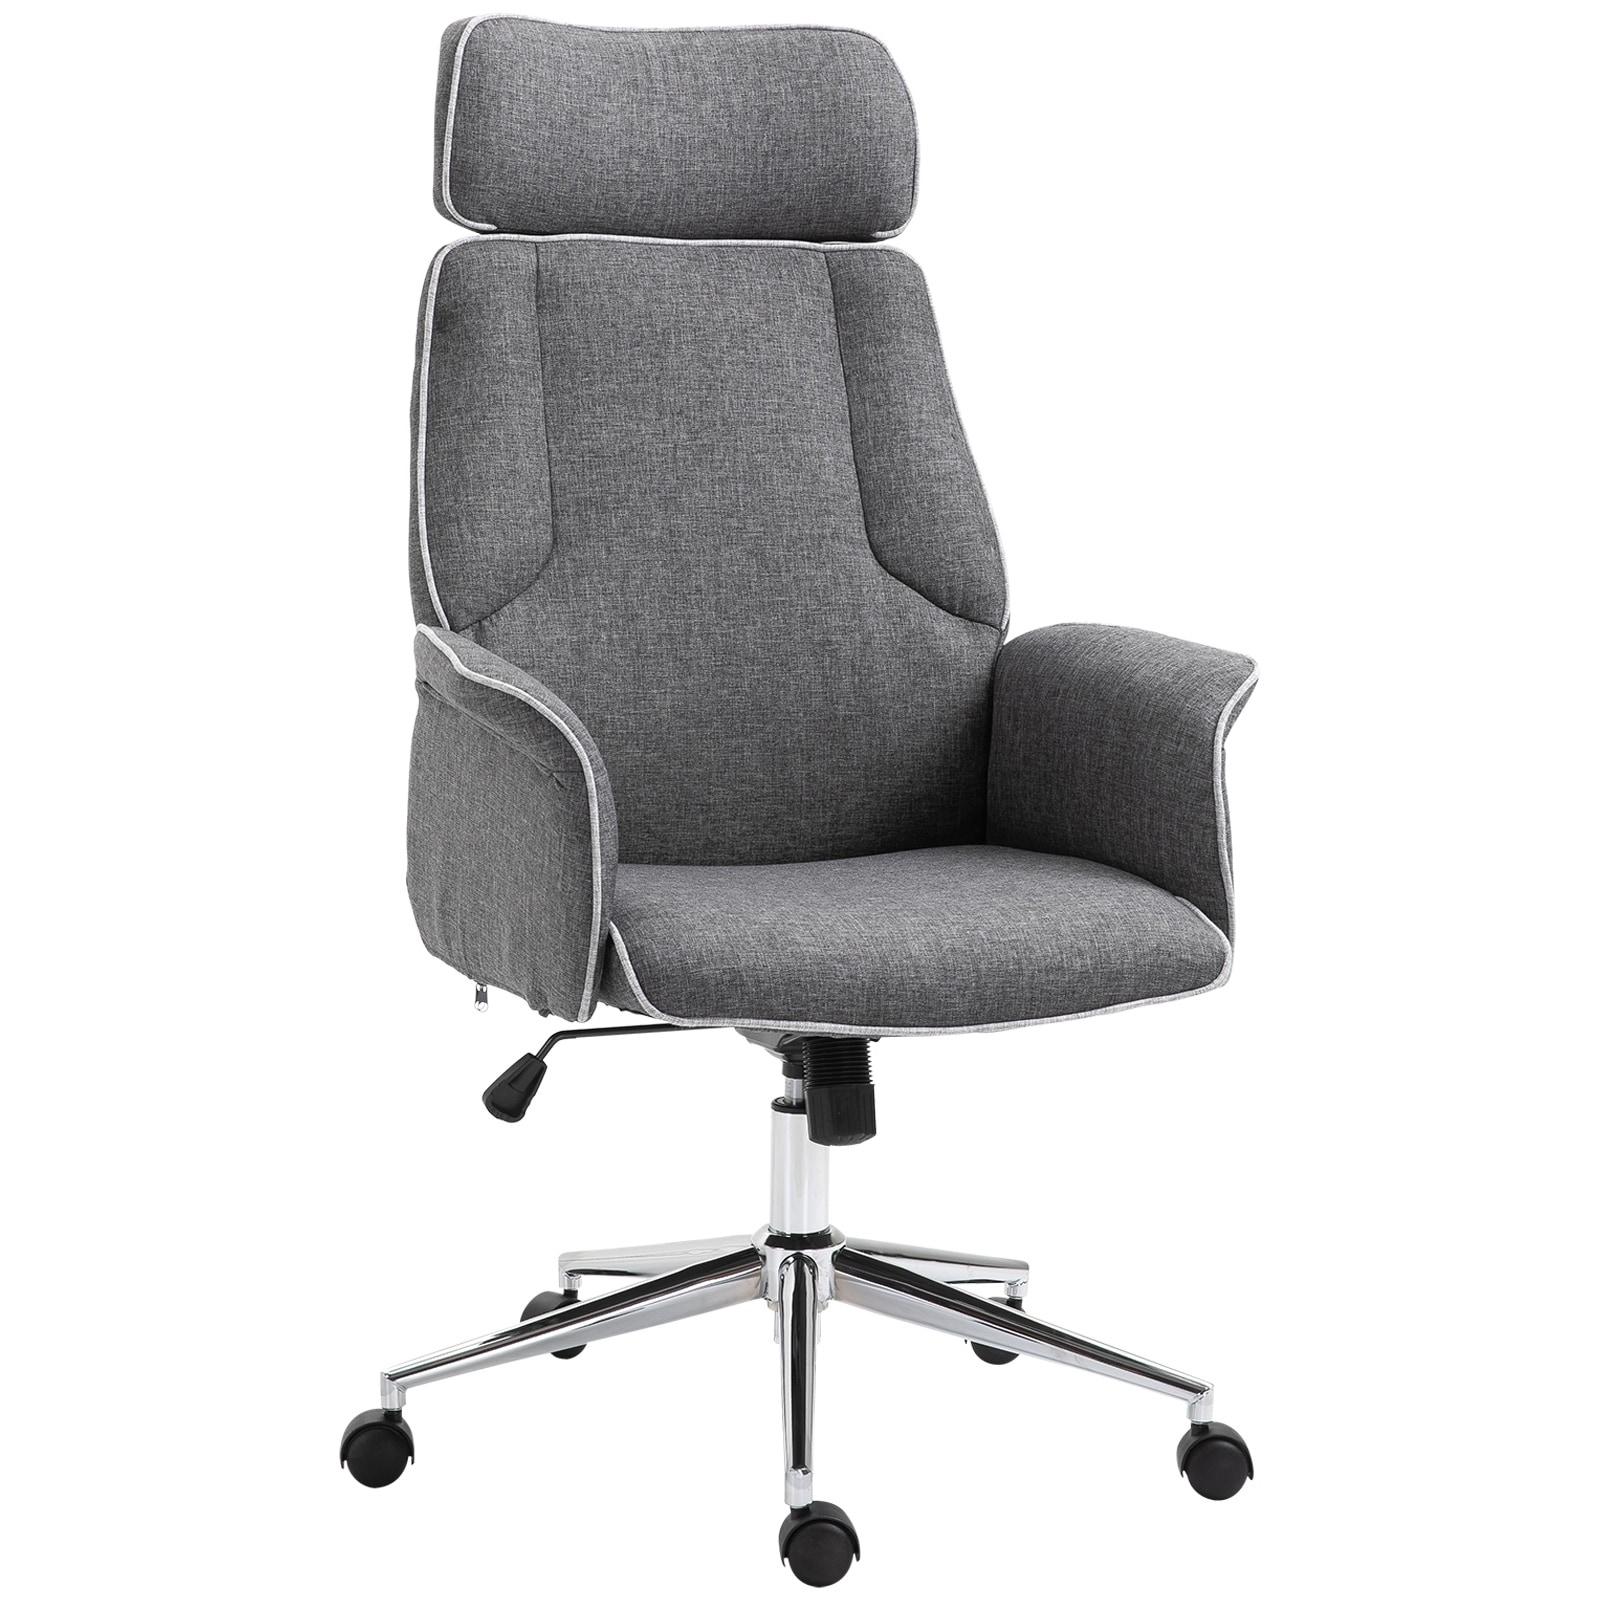 Cushioned  Adjustable Computer Desk Office Chair Swivel Chrome Leg Fabric Grey